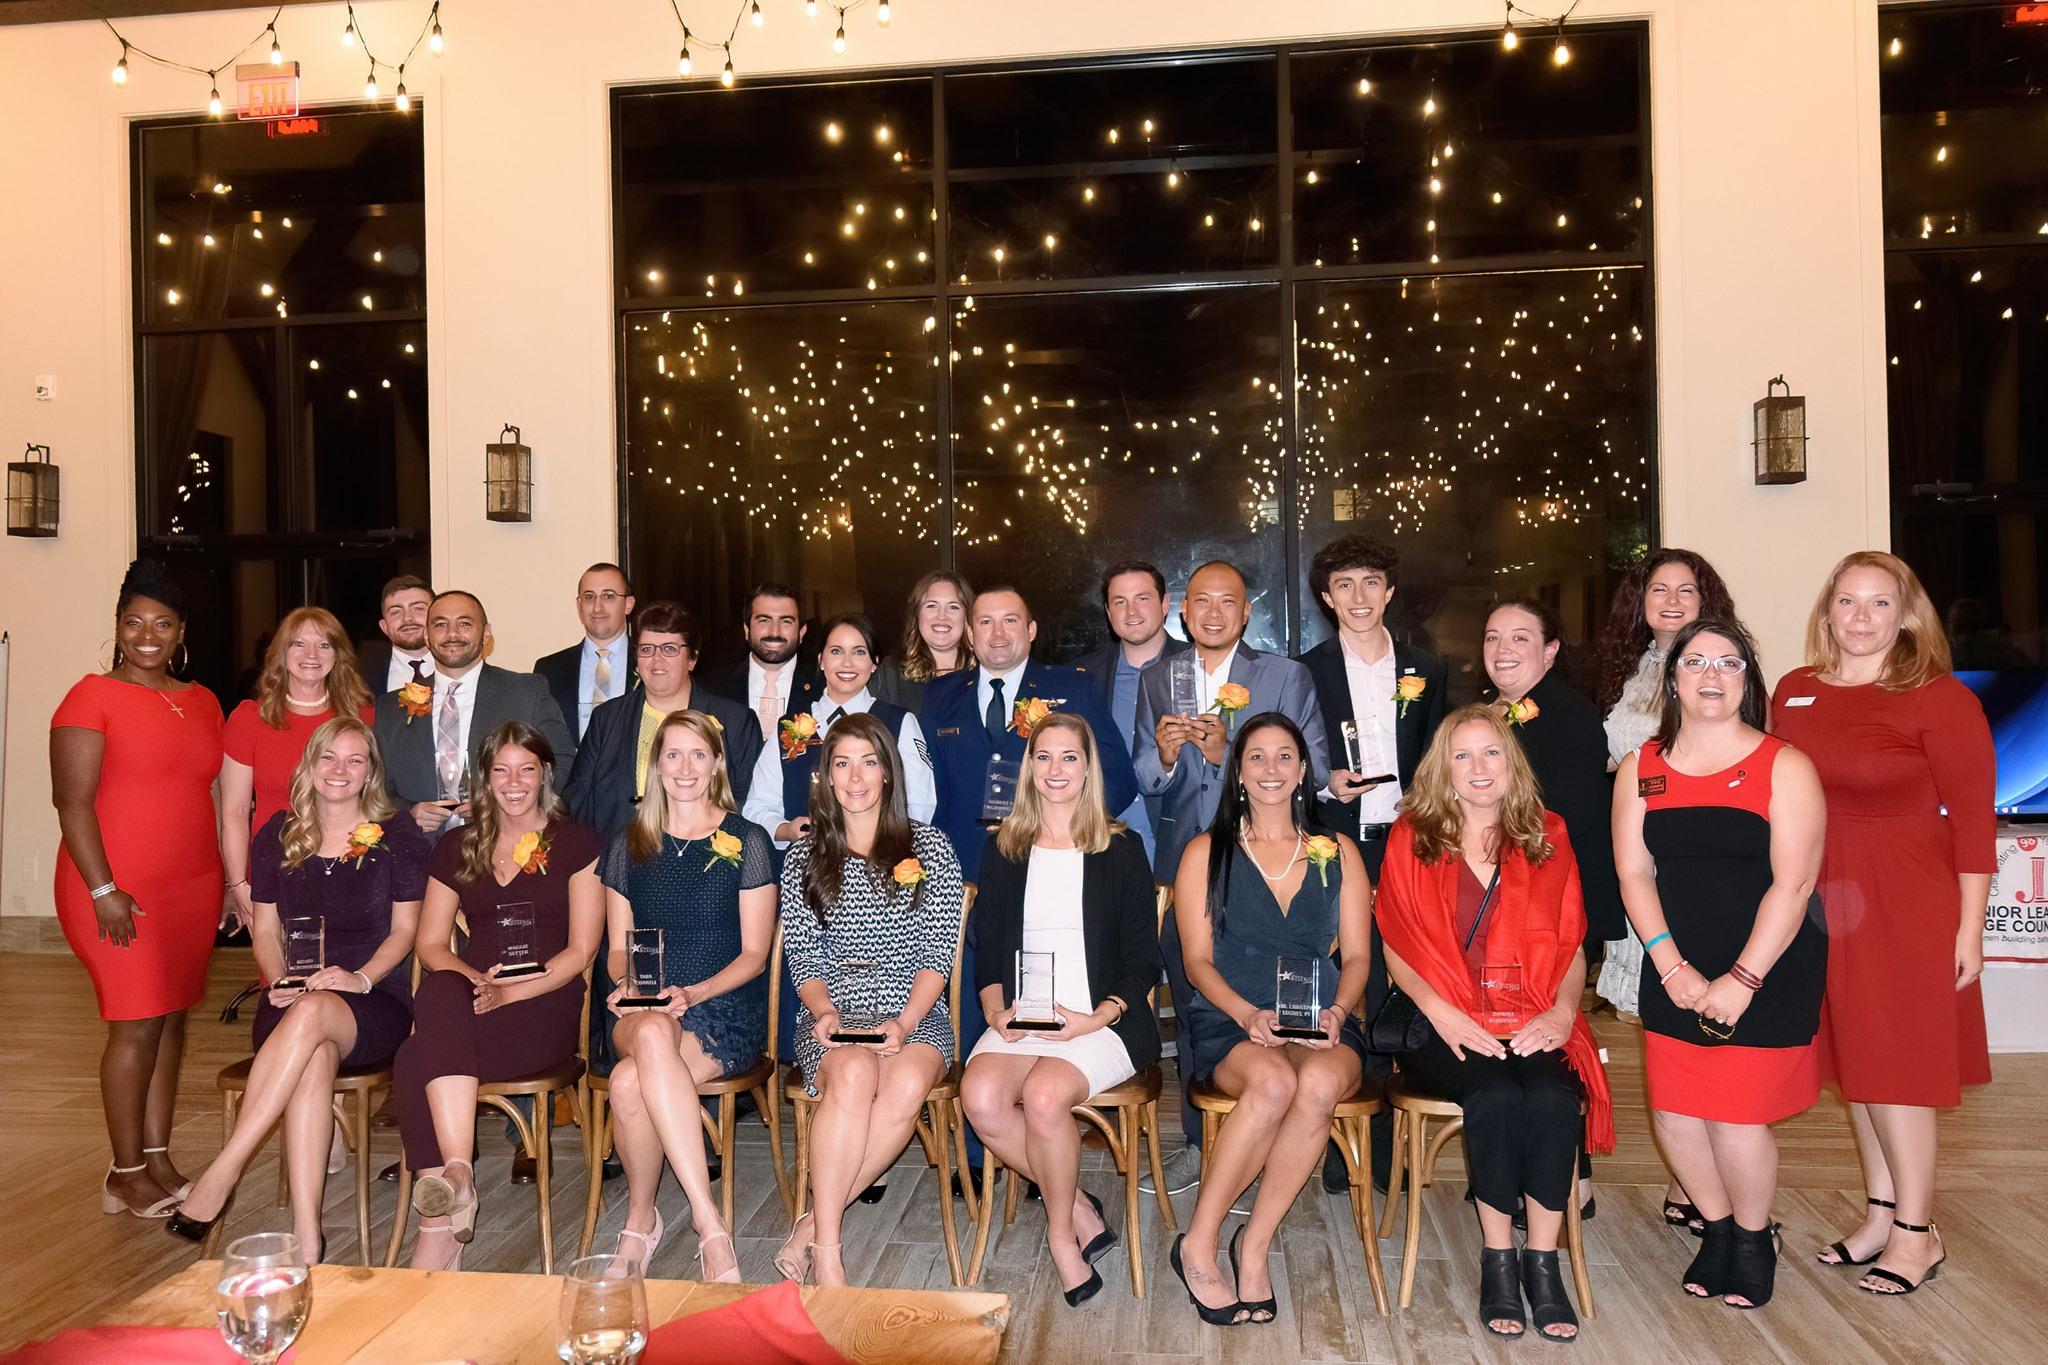 WALDEN SAVINGS BANK'S NICHOLE MORETTO AWARDED RISING STAR AWARD